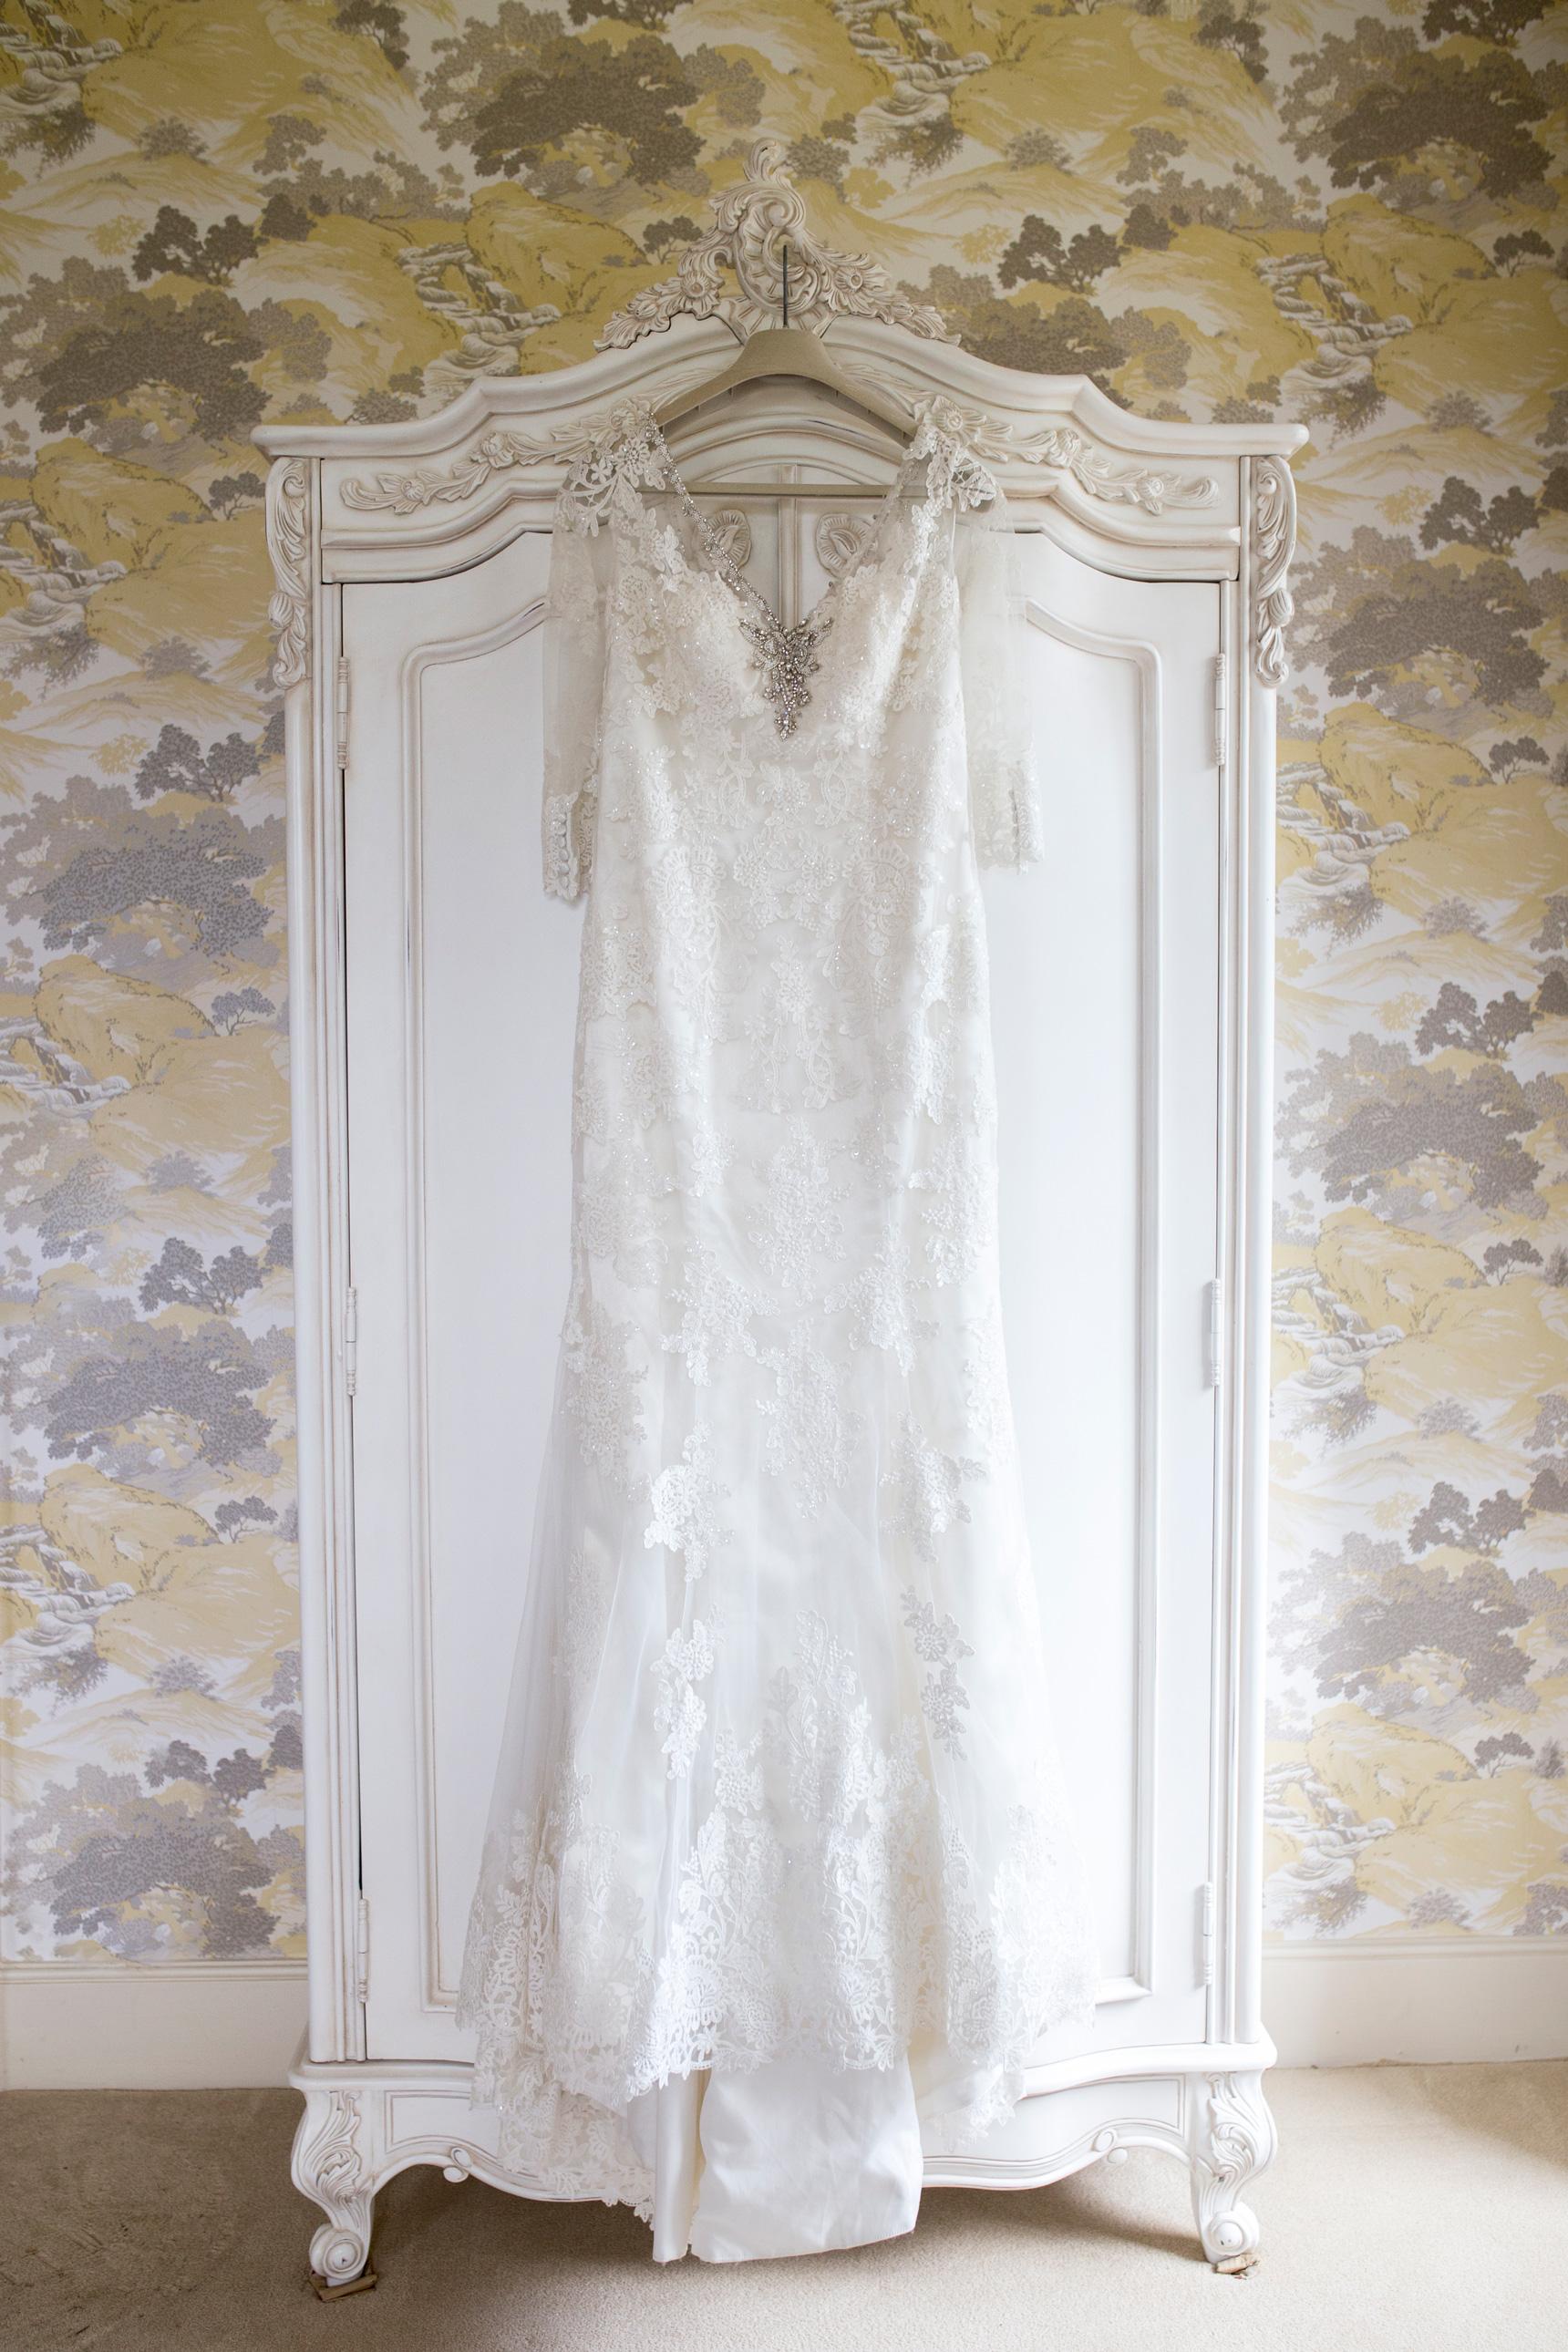 Wedding Dress, Bedfordshire Wedding, Embellished Dress,